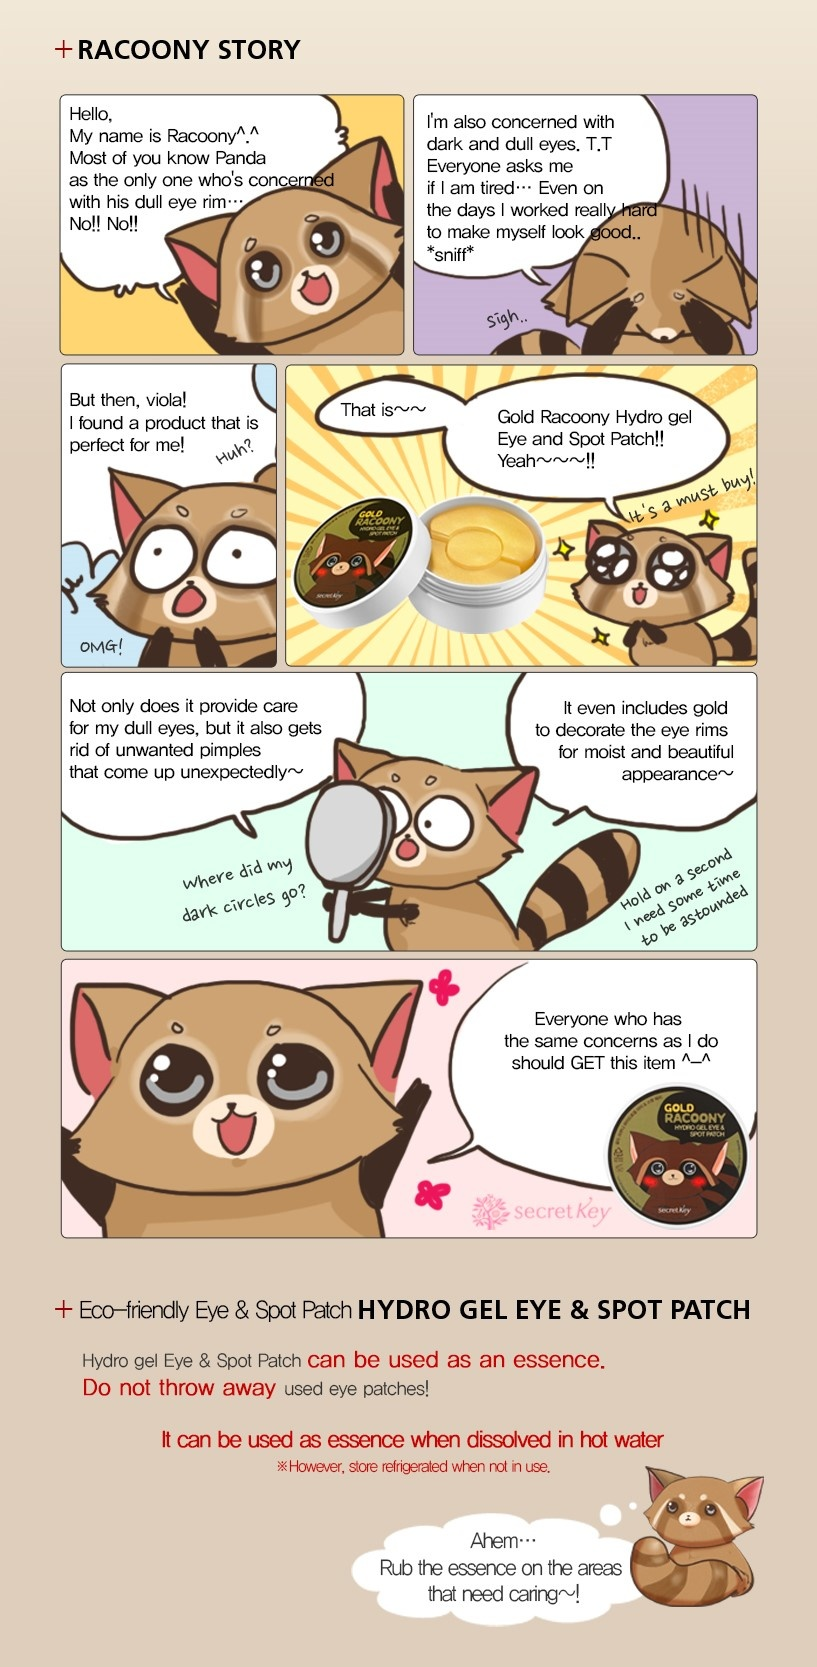 Gold Racoony Hydrogel Eye & Spot Patch-4